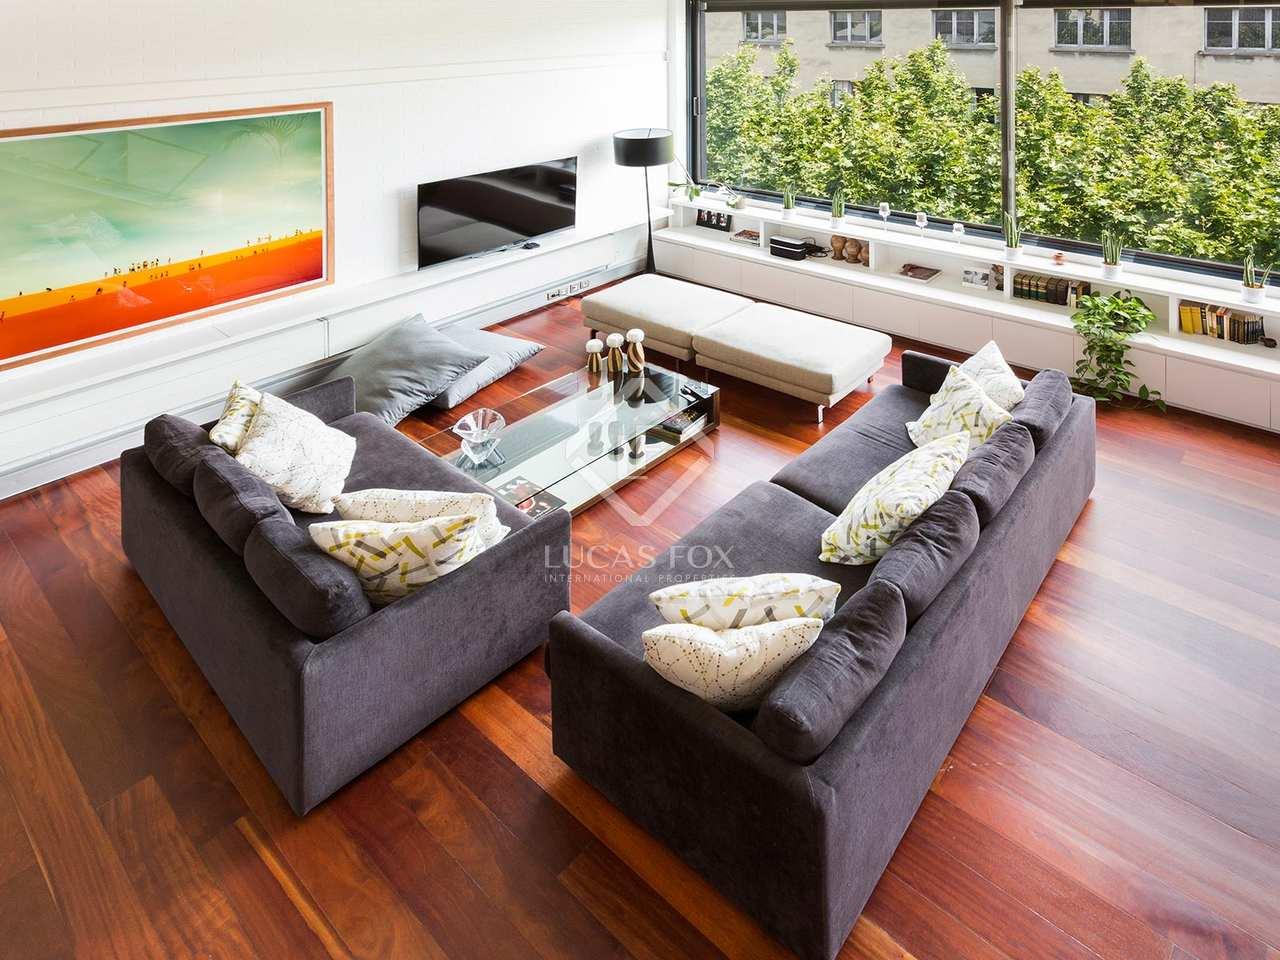 3 Bedroom Loft Style Property For Sale In Poblenou